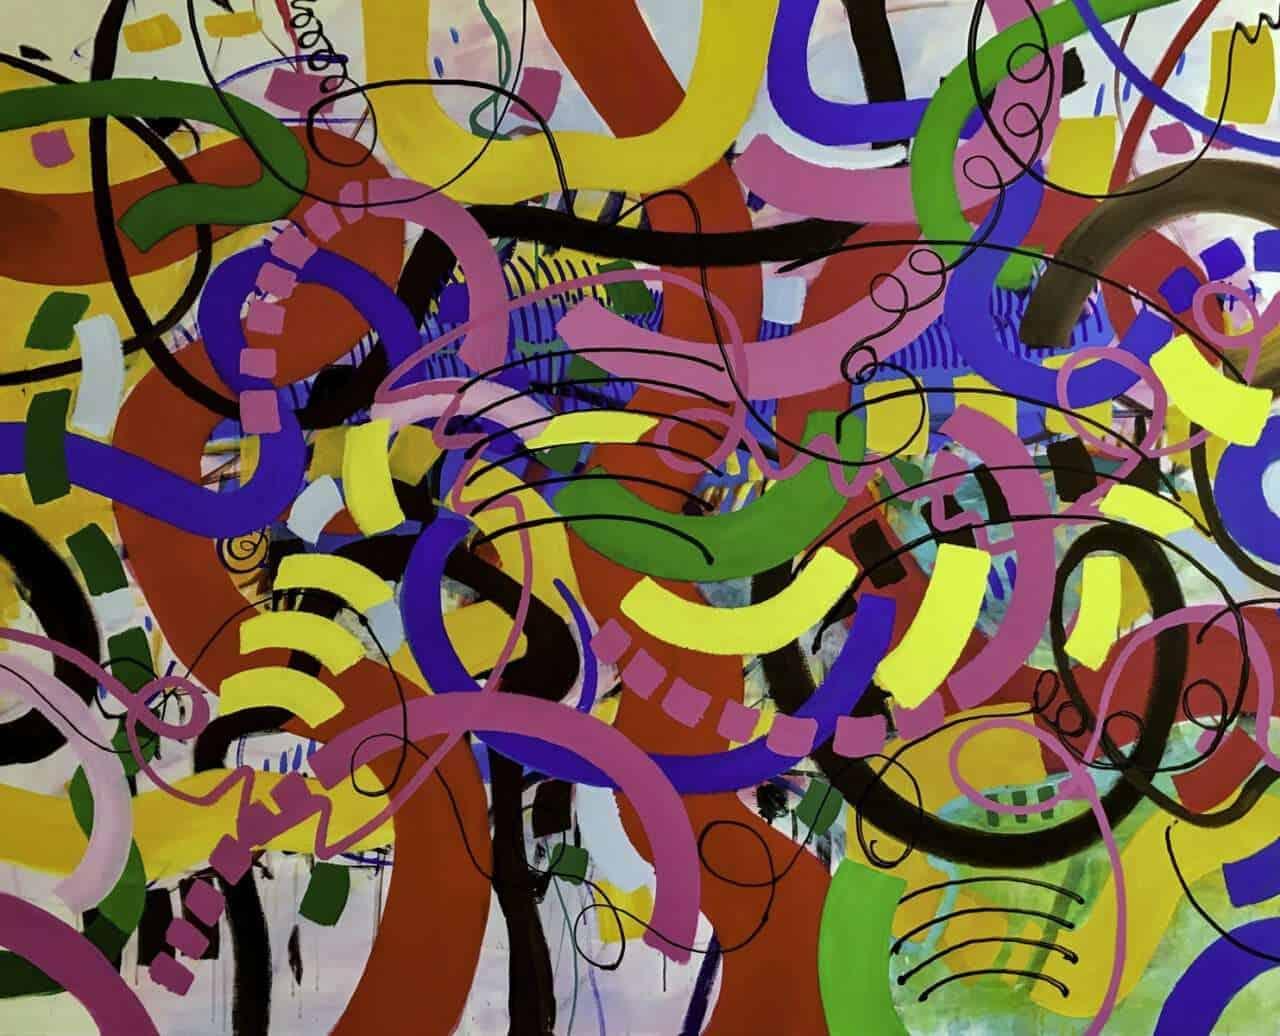 2016-27b_Music-for-the-Eyes-2_200x160cm_Acrylic-on-canvas-2